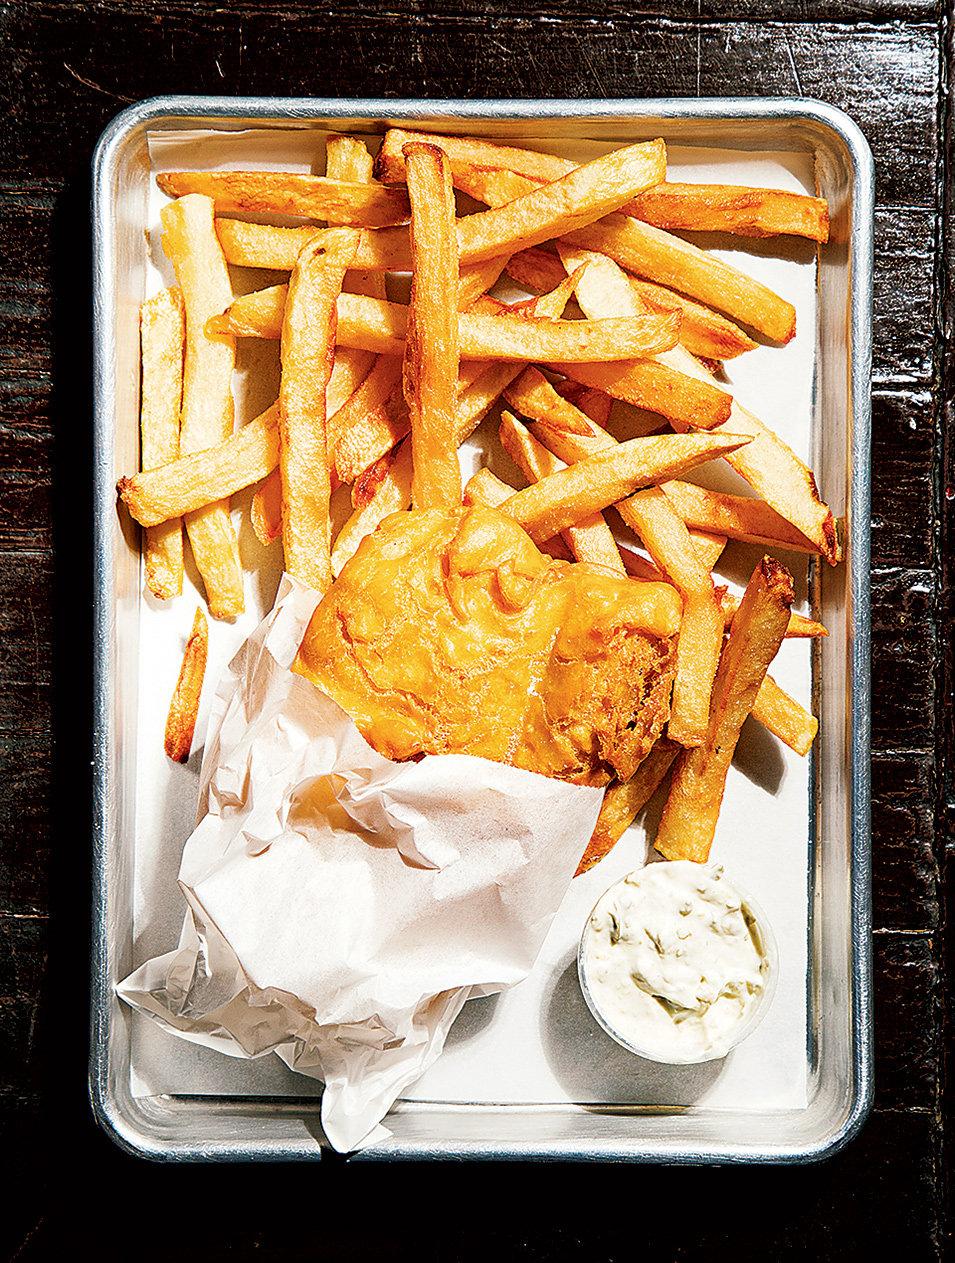 Cheap Eats 2015: Eamonn's a Dublin Chipper